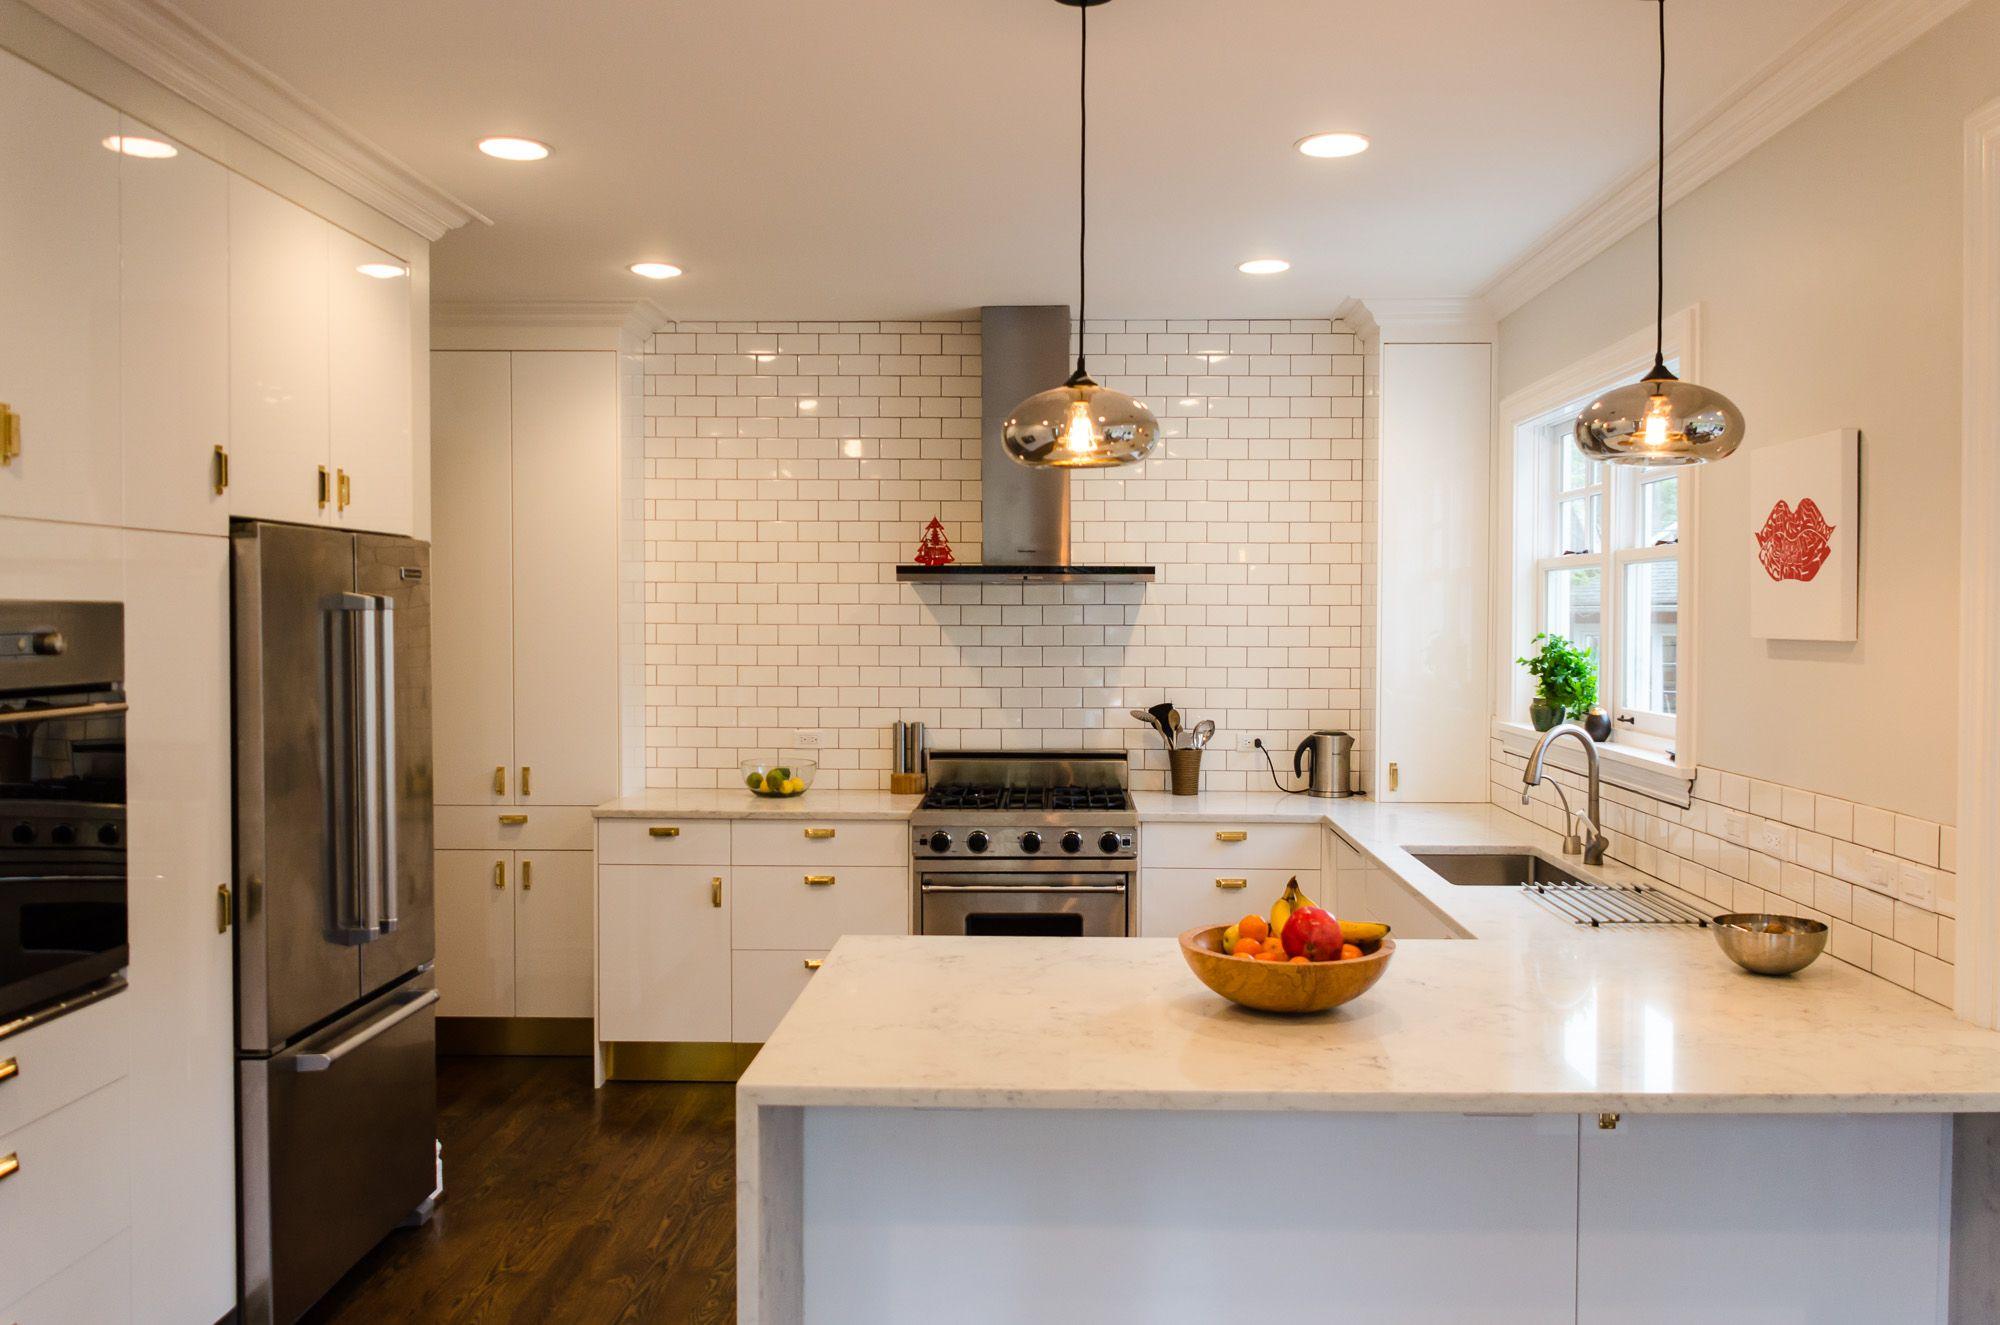 Hereus a few hacks to inspire your next ikea kitchen remodel